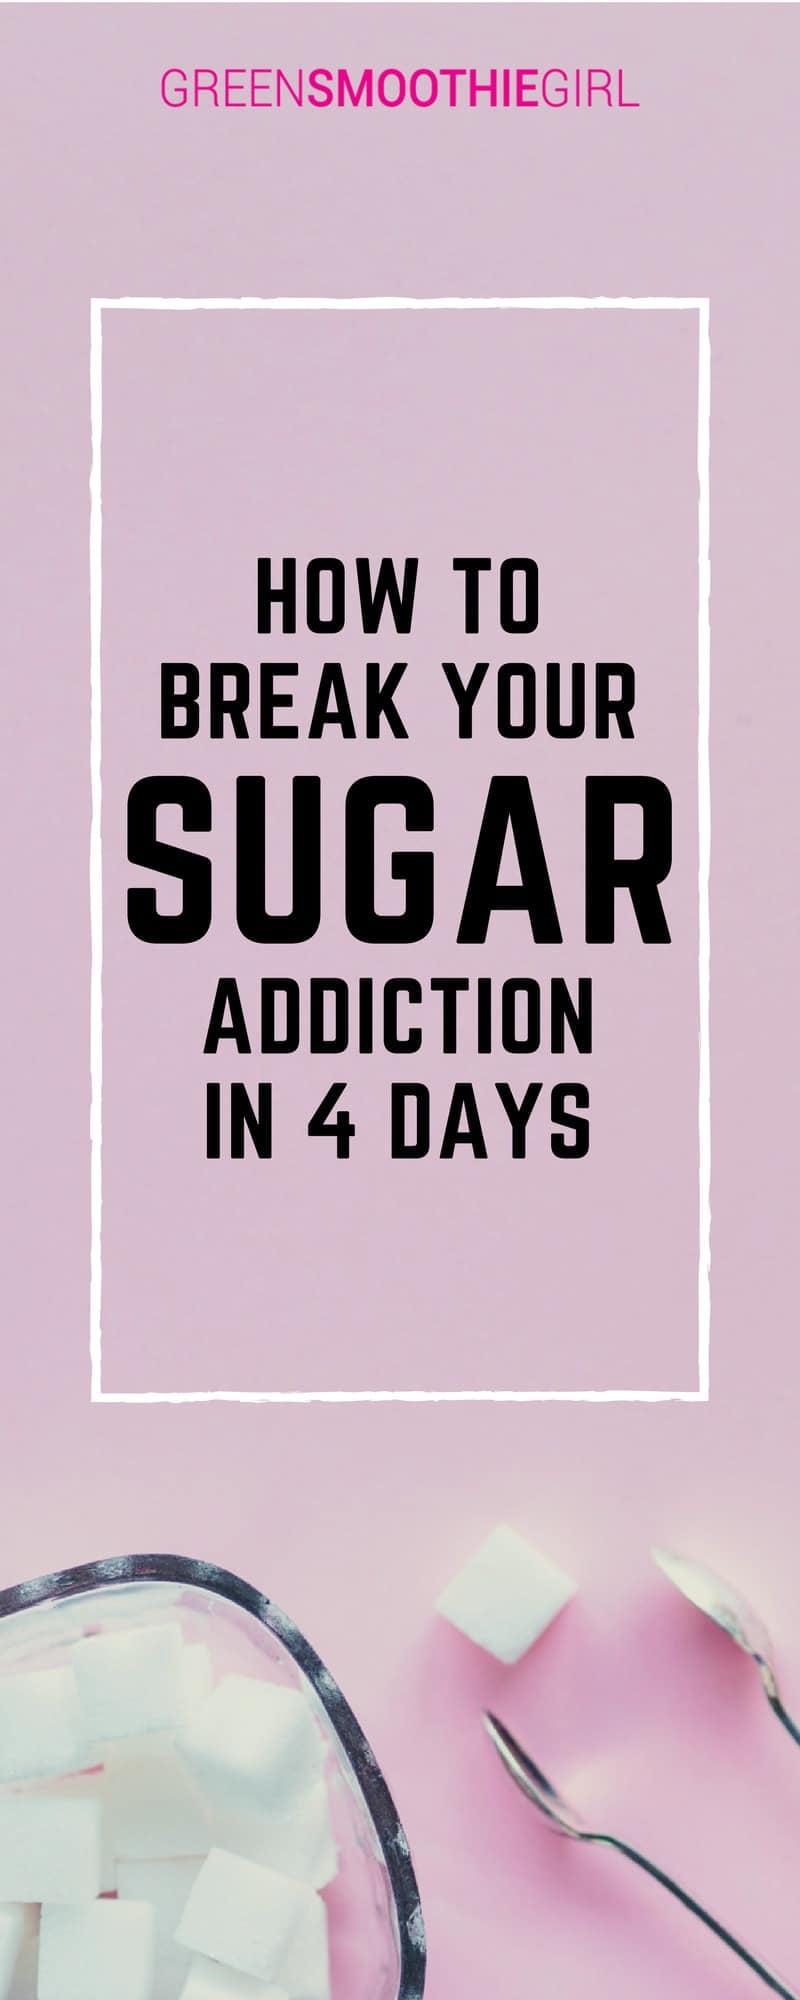 Break Sugar Addiction | How To Break Your Sugar Addiction in Four Days